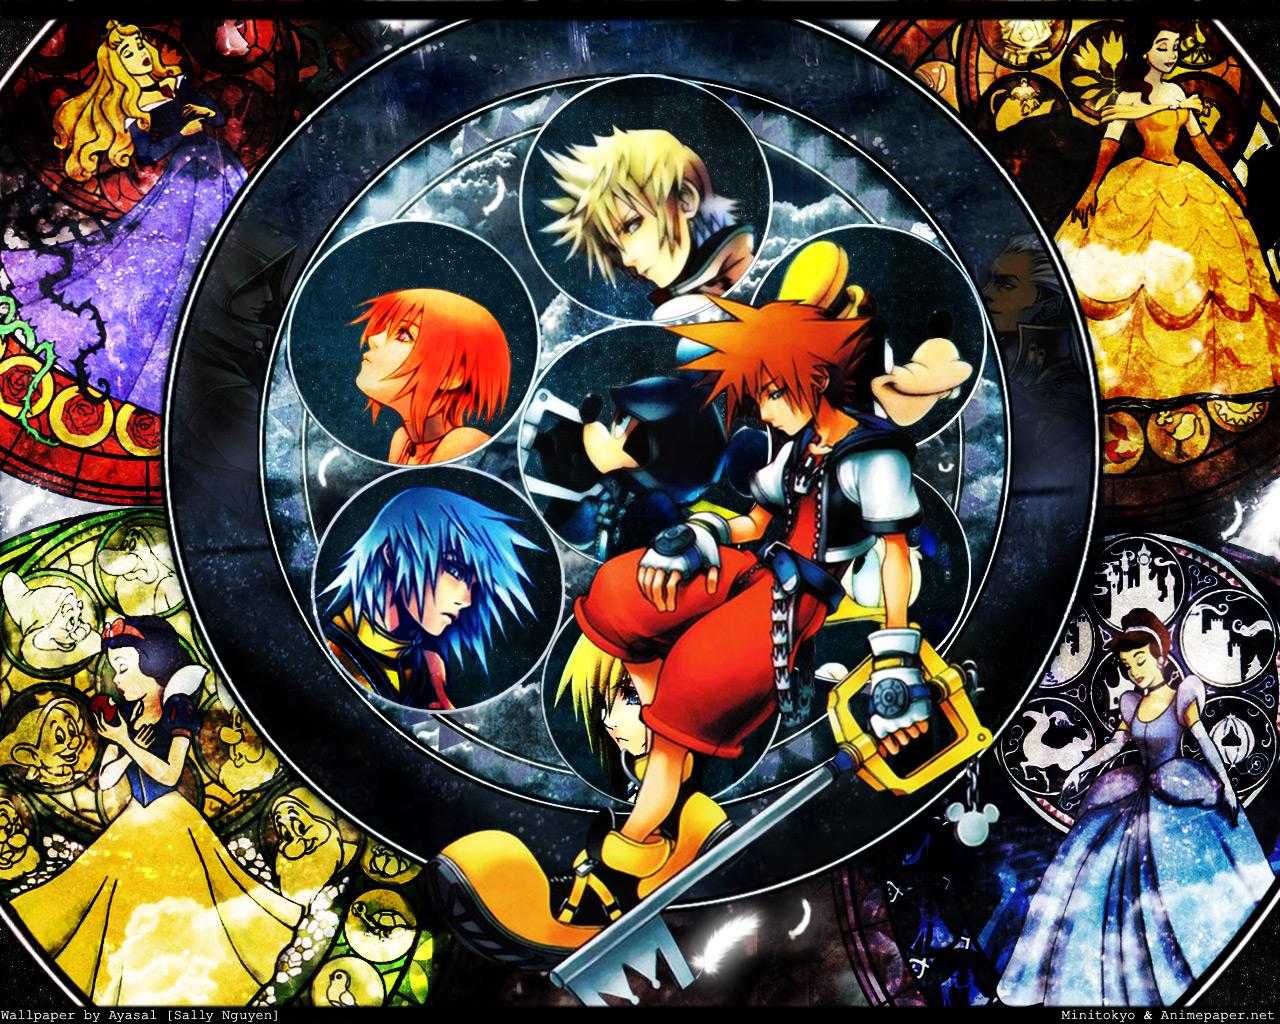 Kingdom hearts wallpaper zerochan anime image board - Kingdom hearts wallpaper ...